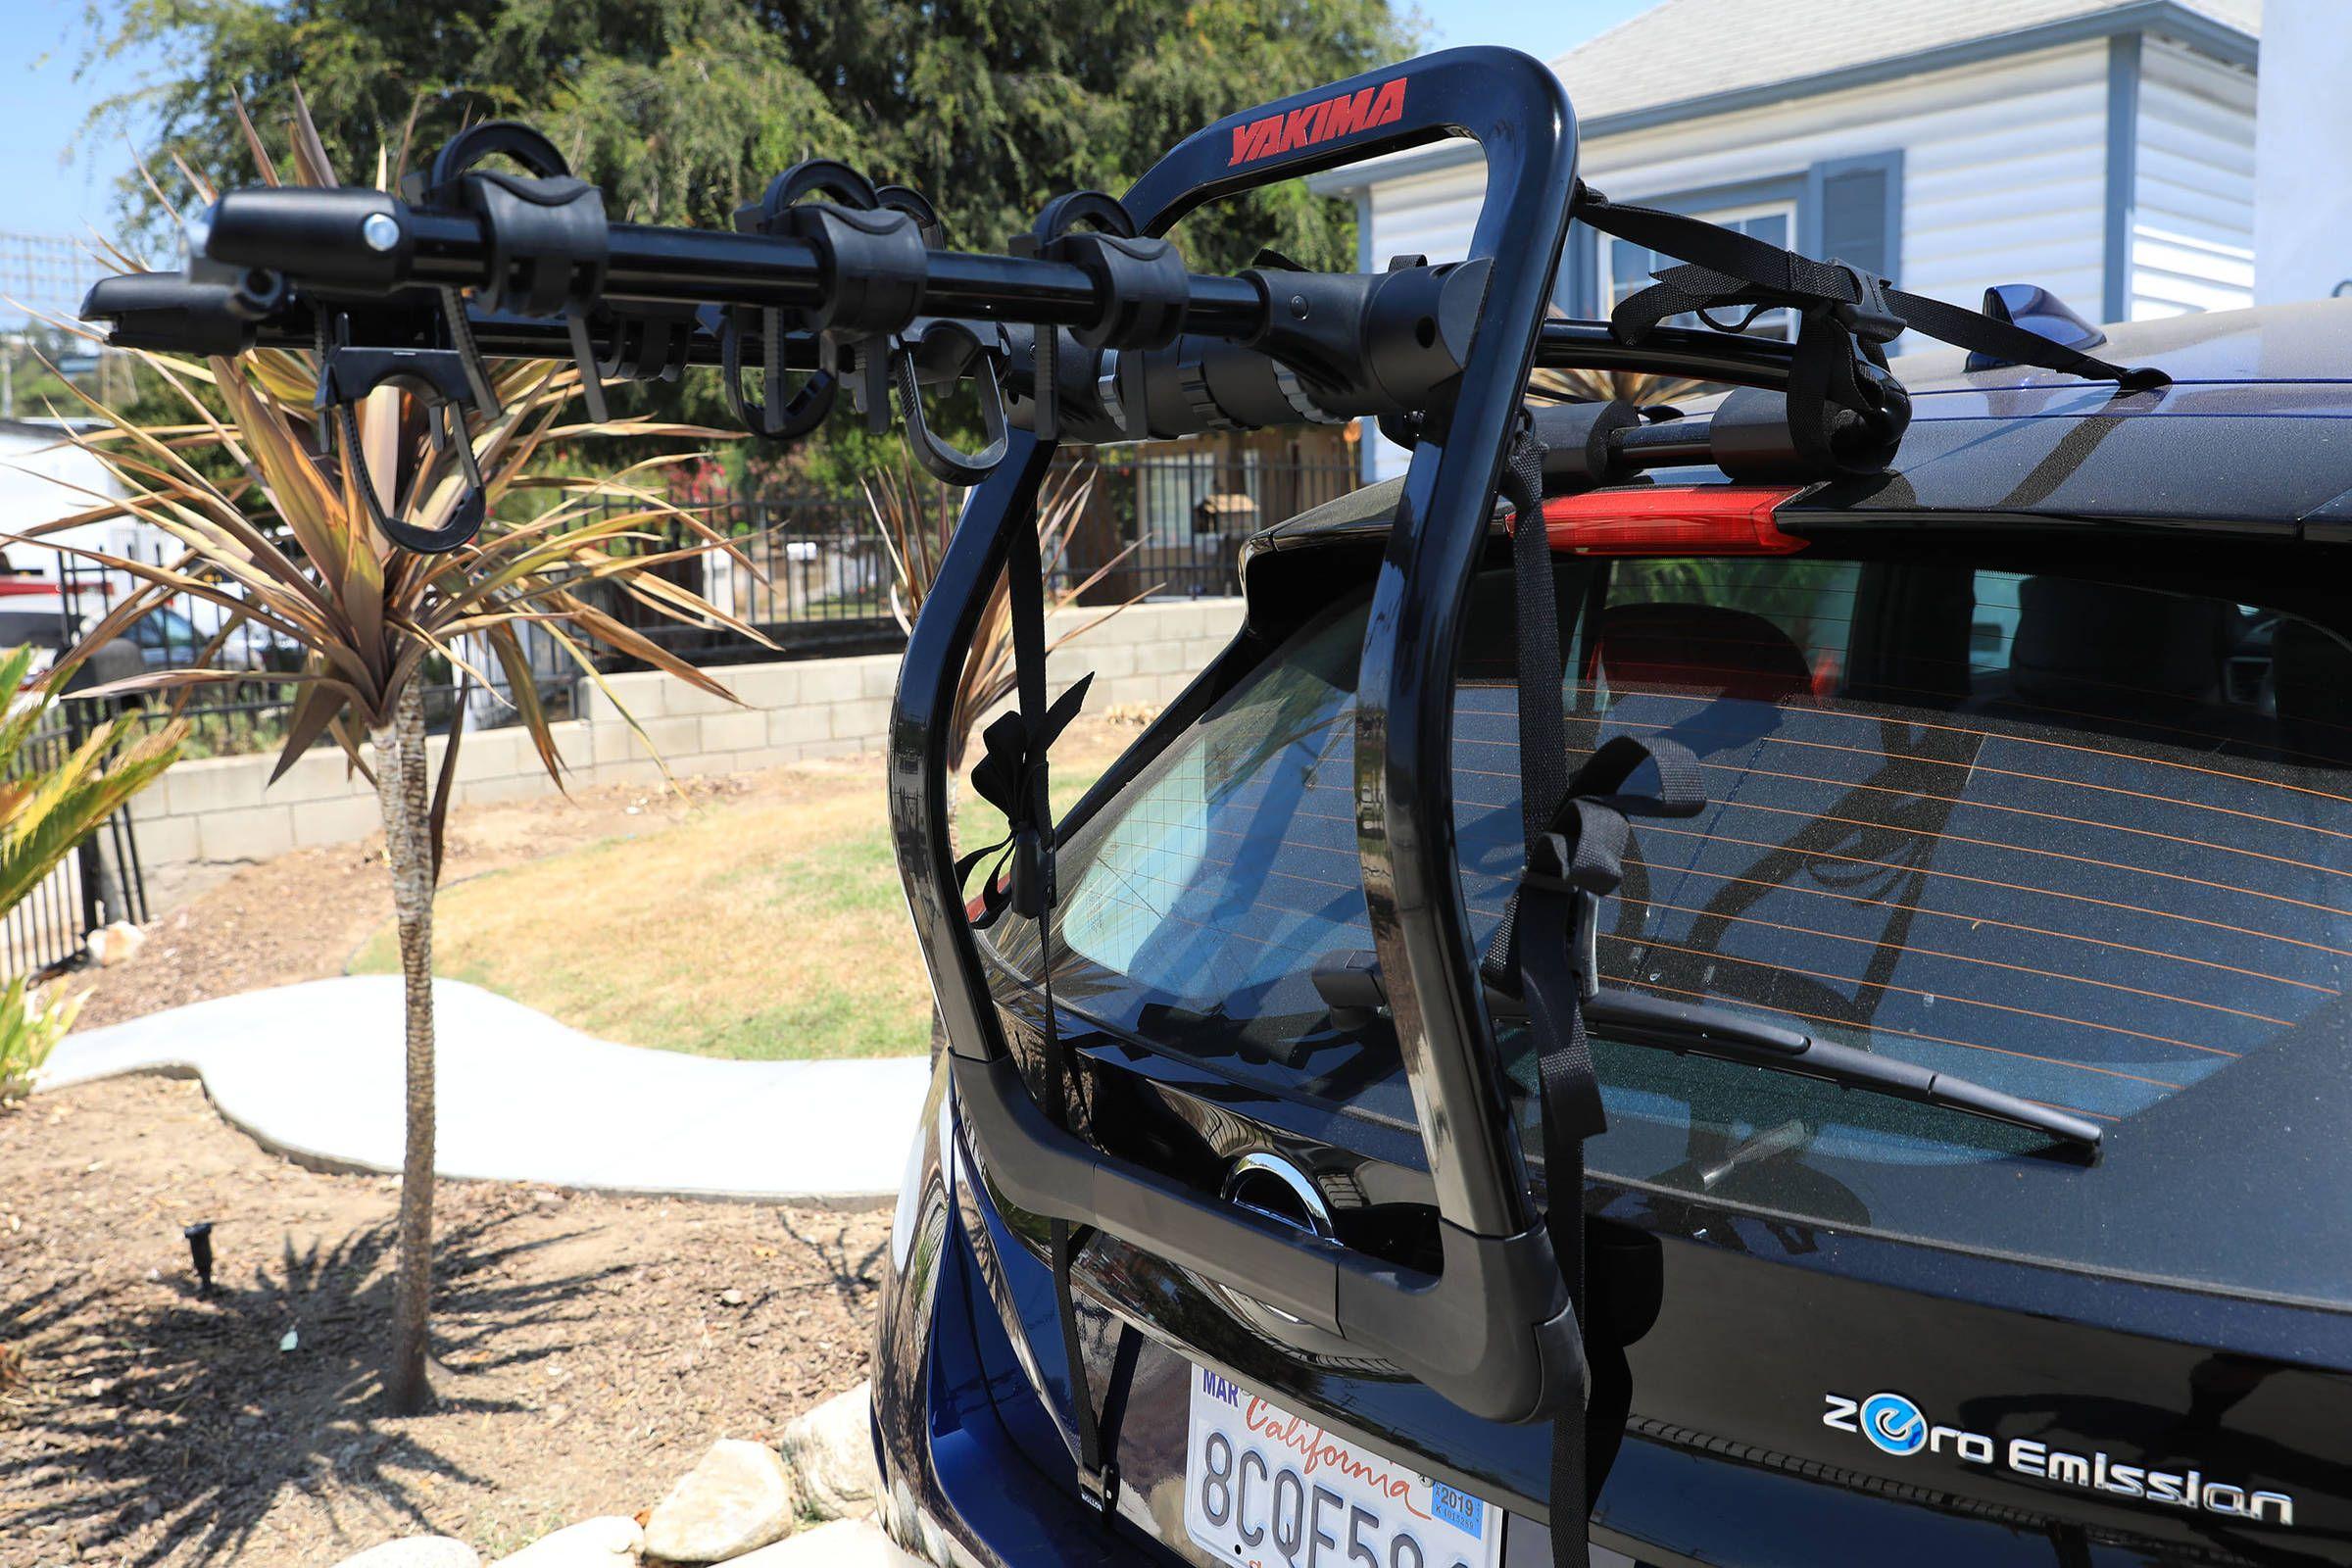 sport utility with a yakima bike rack